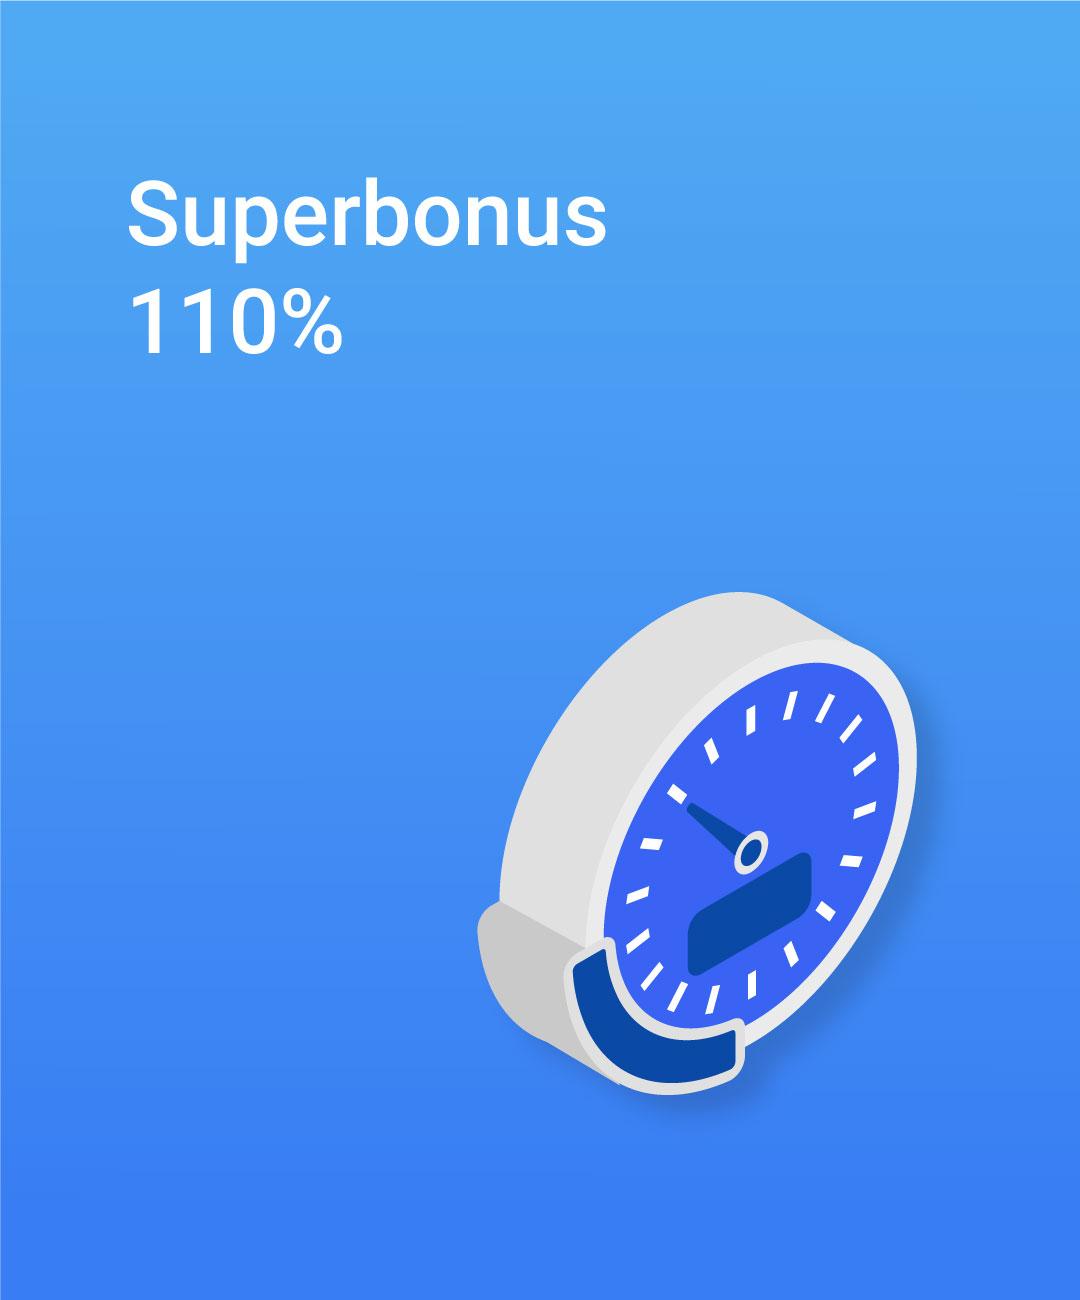 superbonus-110-opportunità-investimento